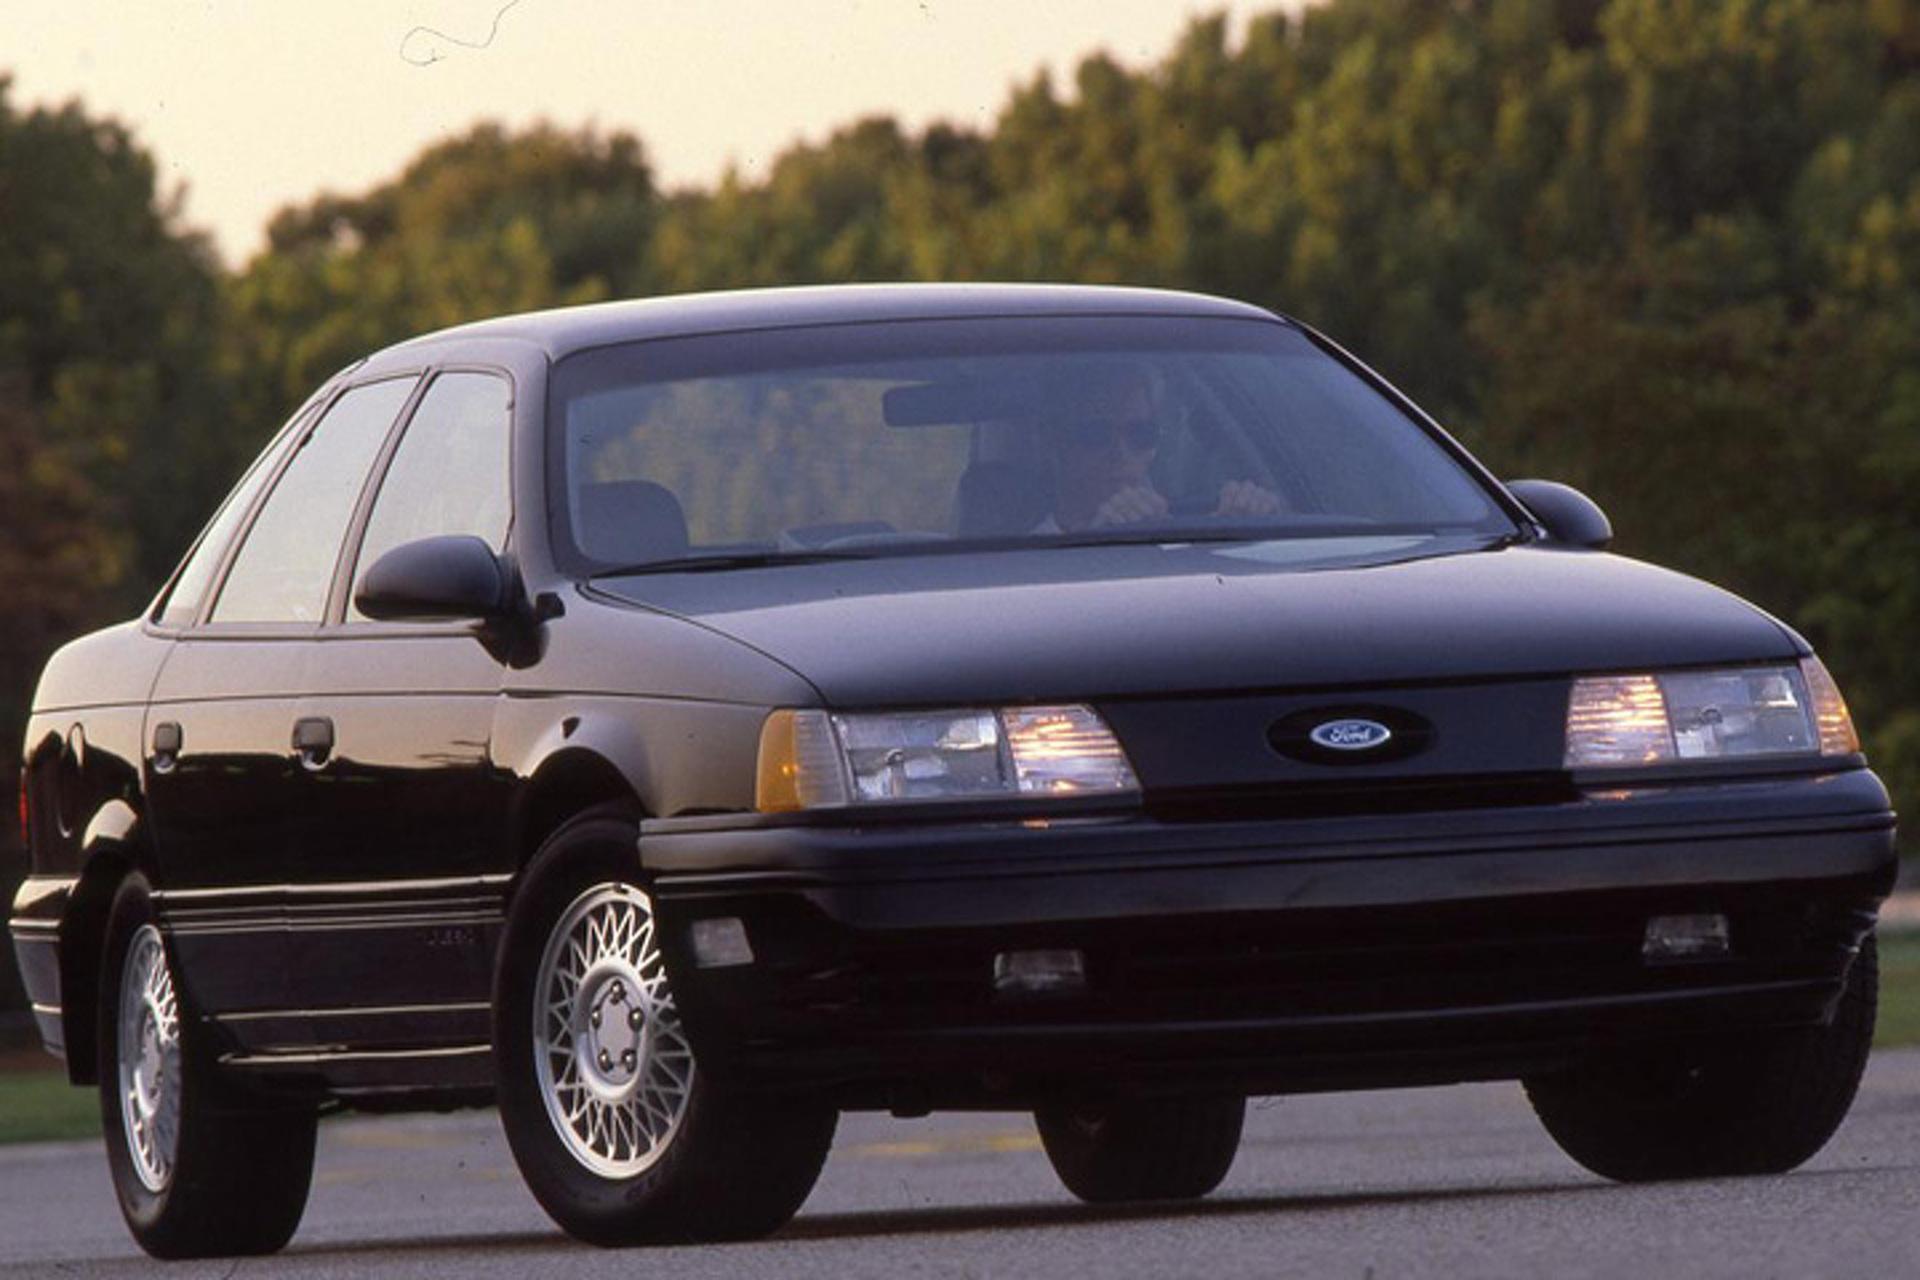 1989 Ford Taurus SHO